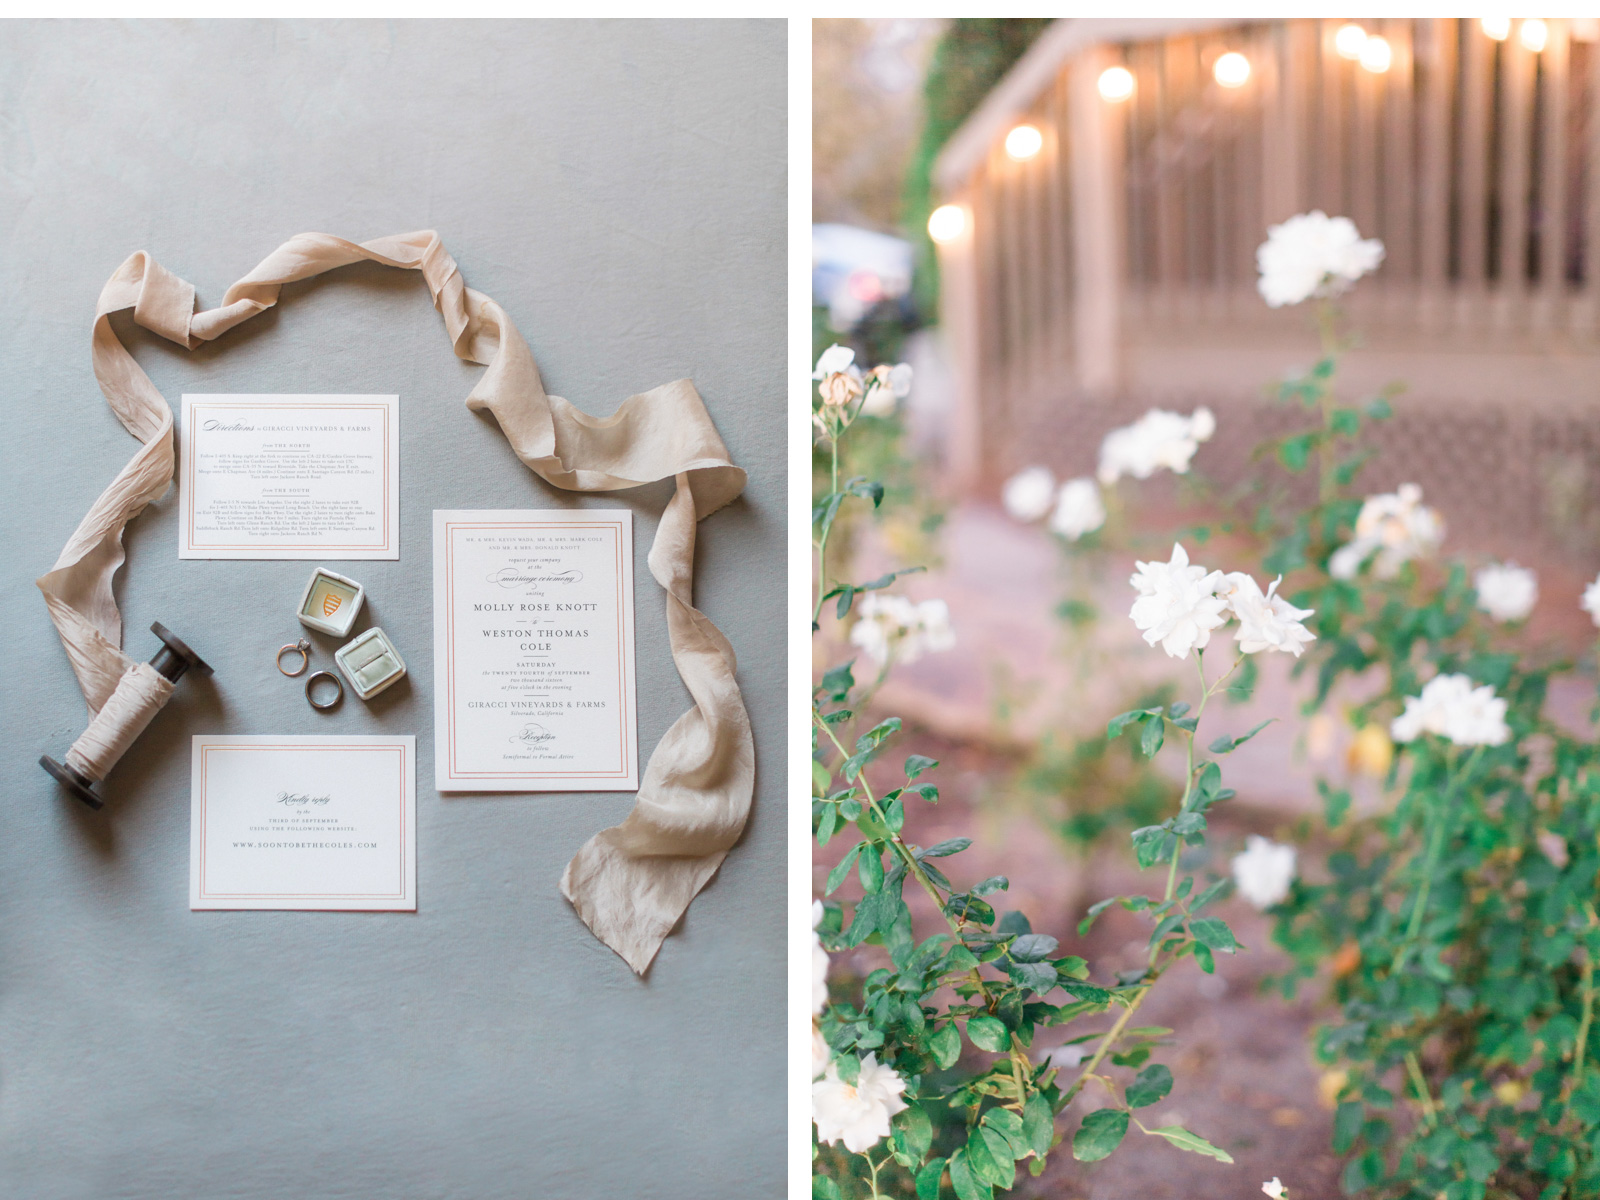 Style-Me-Pretty-Wedding-Photographer-Natalie-Schutt-Photography-Calfornia-San-Luis-Obispo_10.jpg